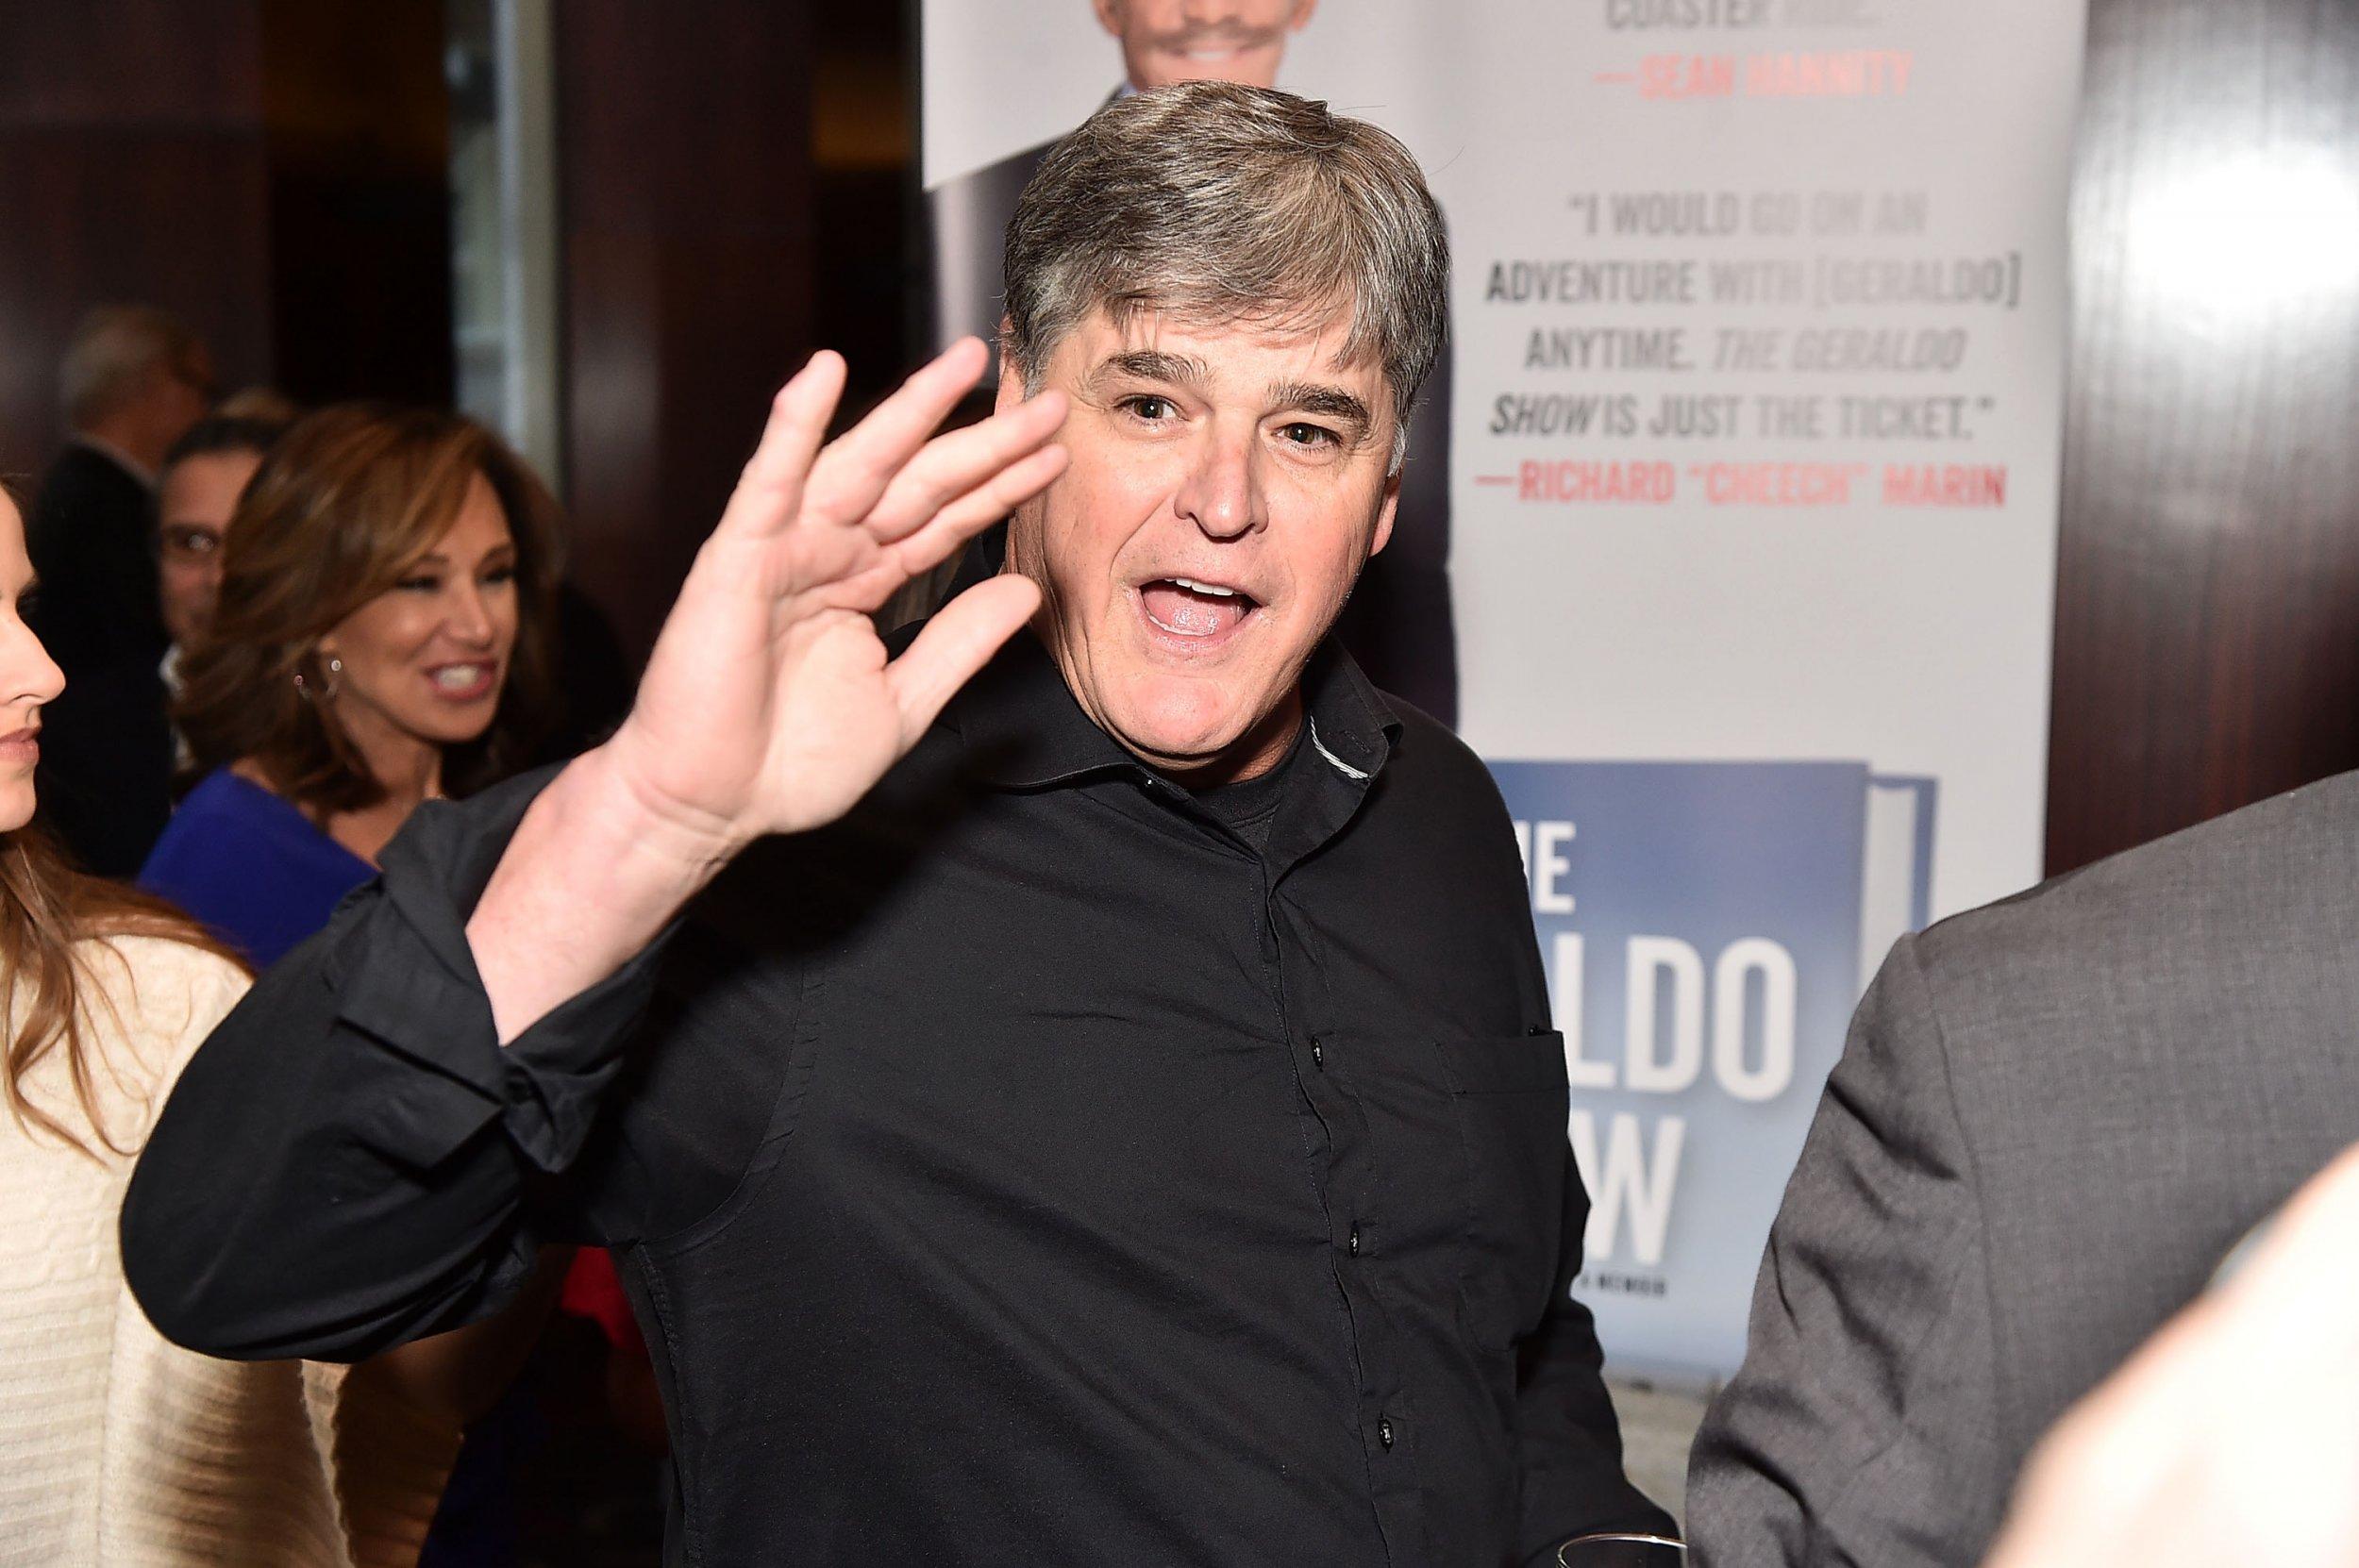 Sean Hannity, Mueller, Joseph Stalin secret police chief